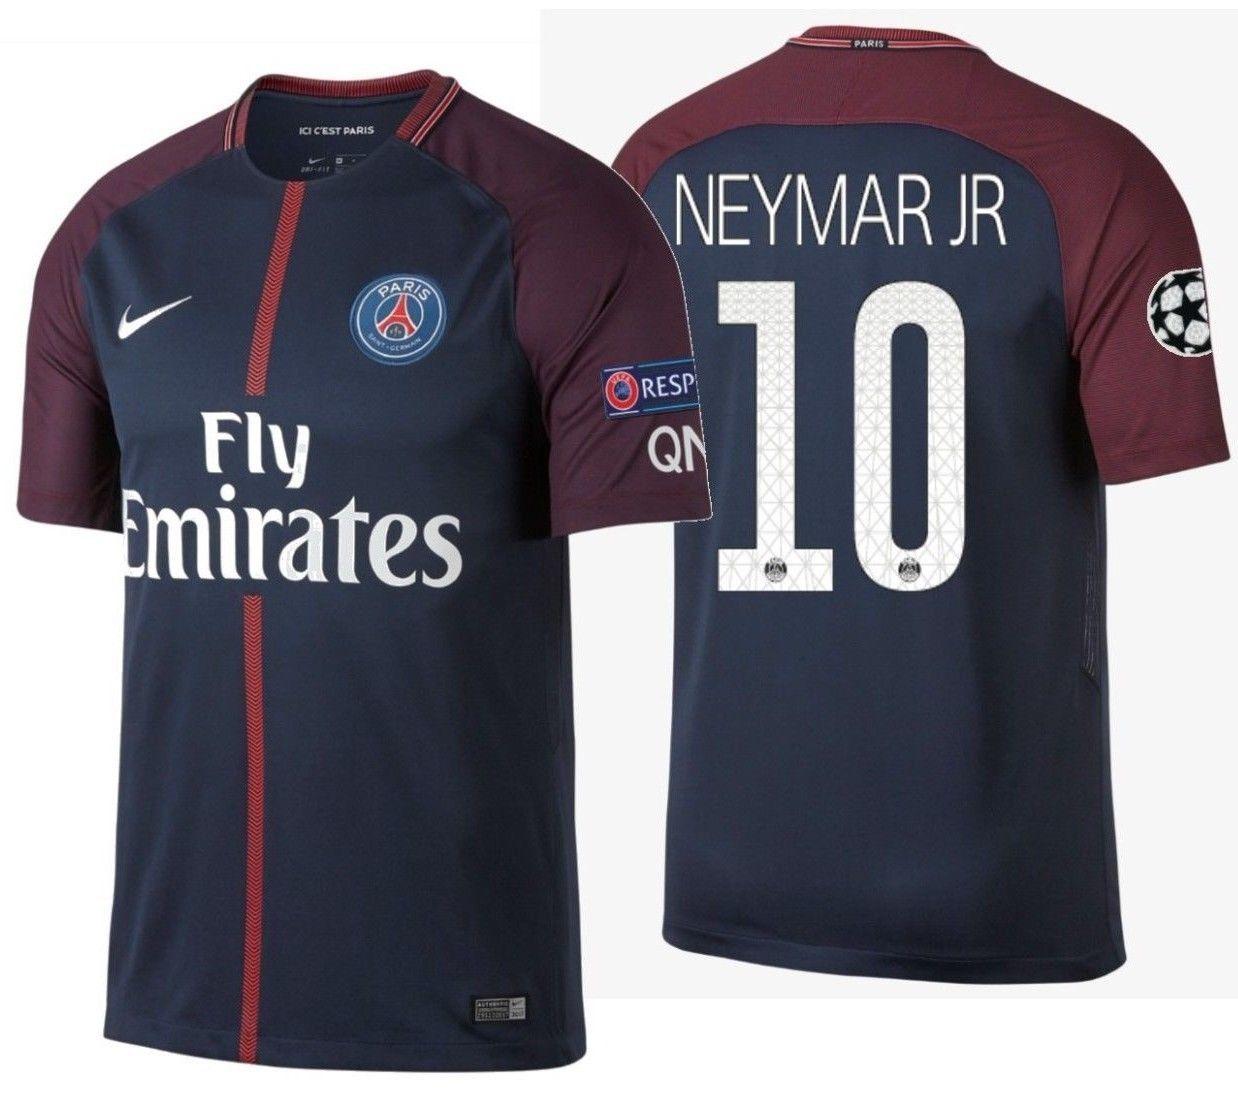 Nike Neymar Jr Paris SAINT-GERMAIN Psg Uefa and 50 similar items. S l1600 0d1a7e7e5